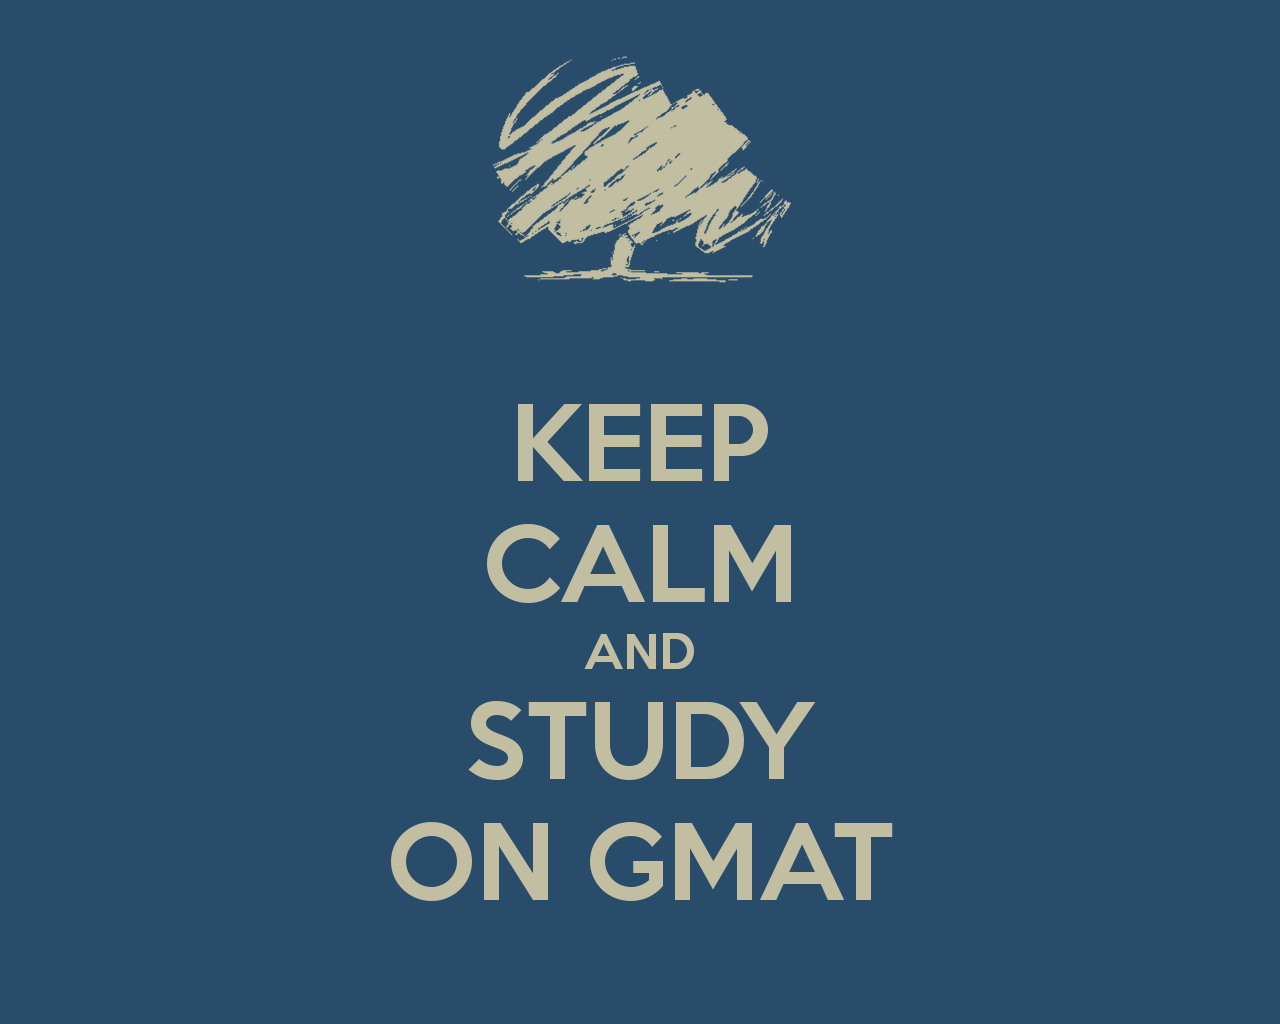 Gmat essays structure